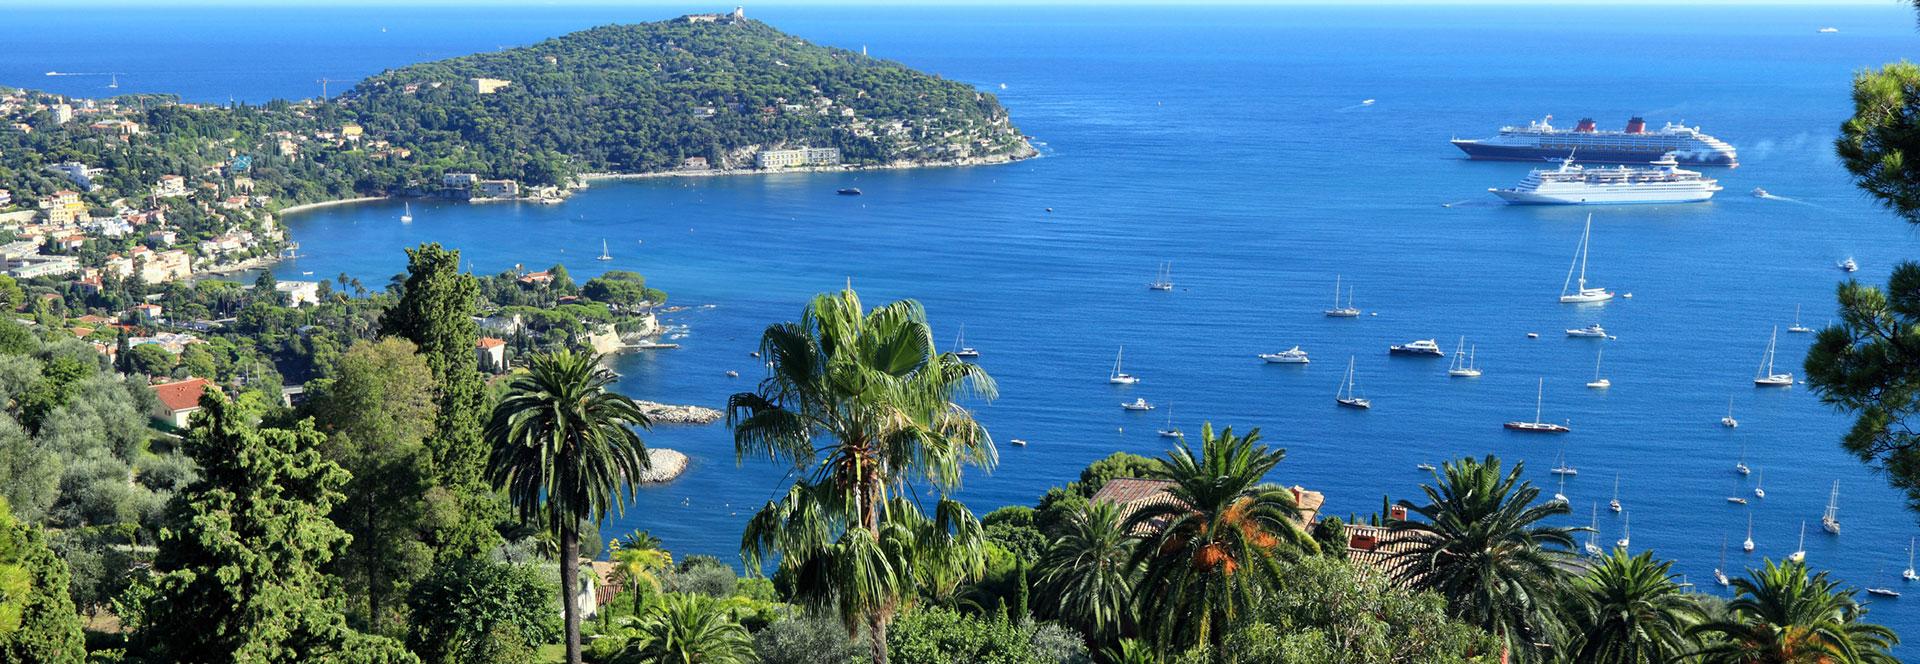 Villefranche-sur-Mer | French riviera luxury real estate